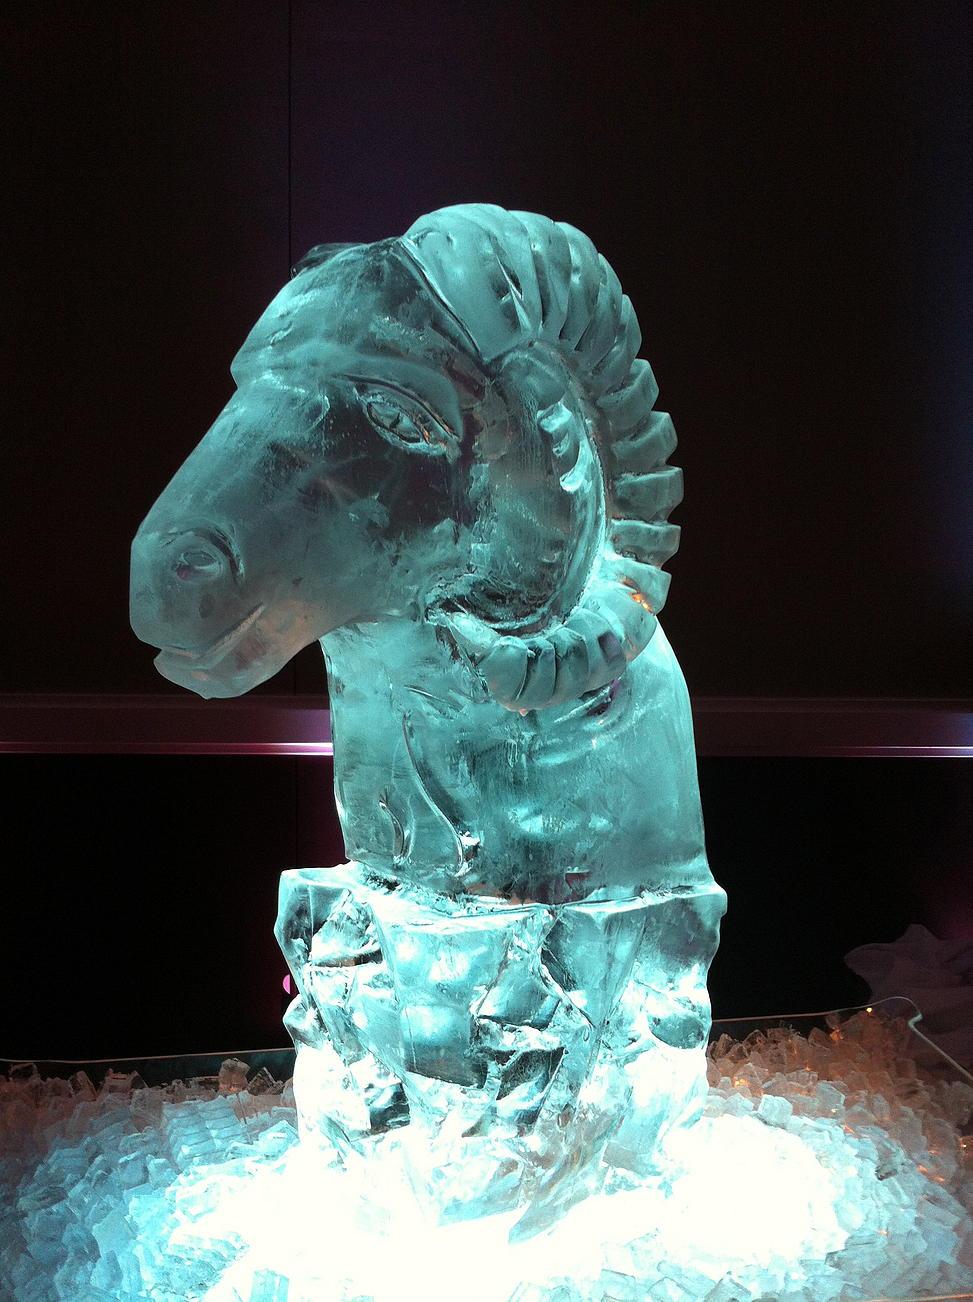 Ram head ice sculpture